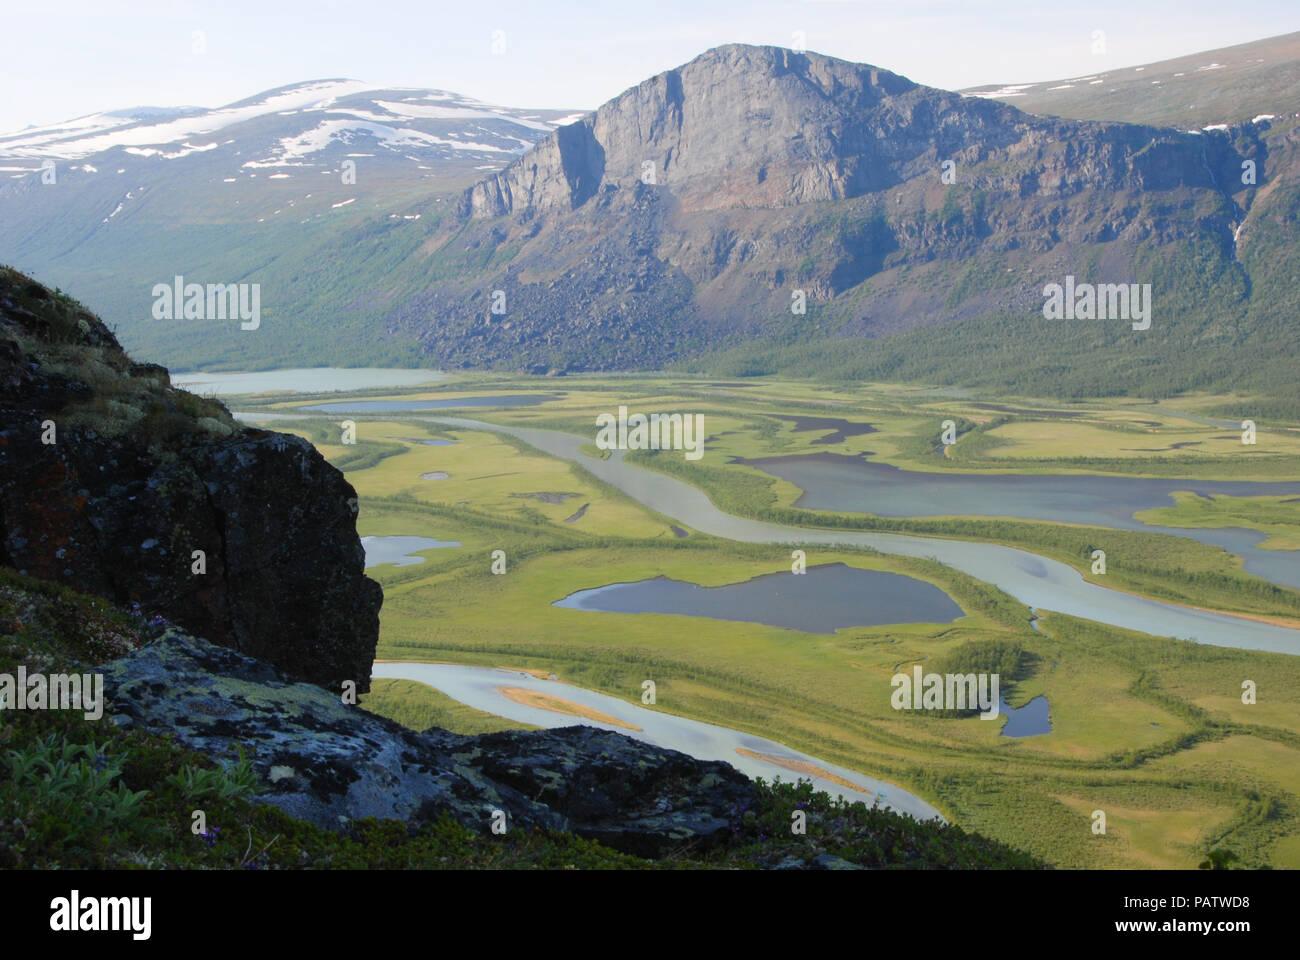 The Beauty of Northern Sweden  - Rapaätno delta. Sarek, Norrbotten, Sweden. Stock Photo